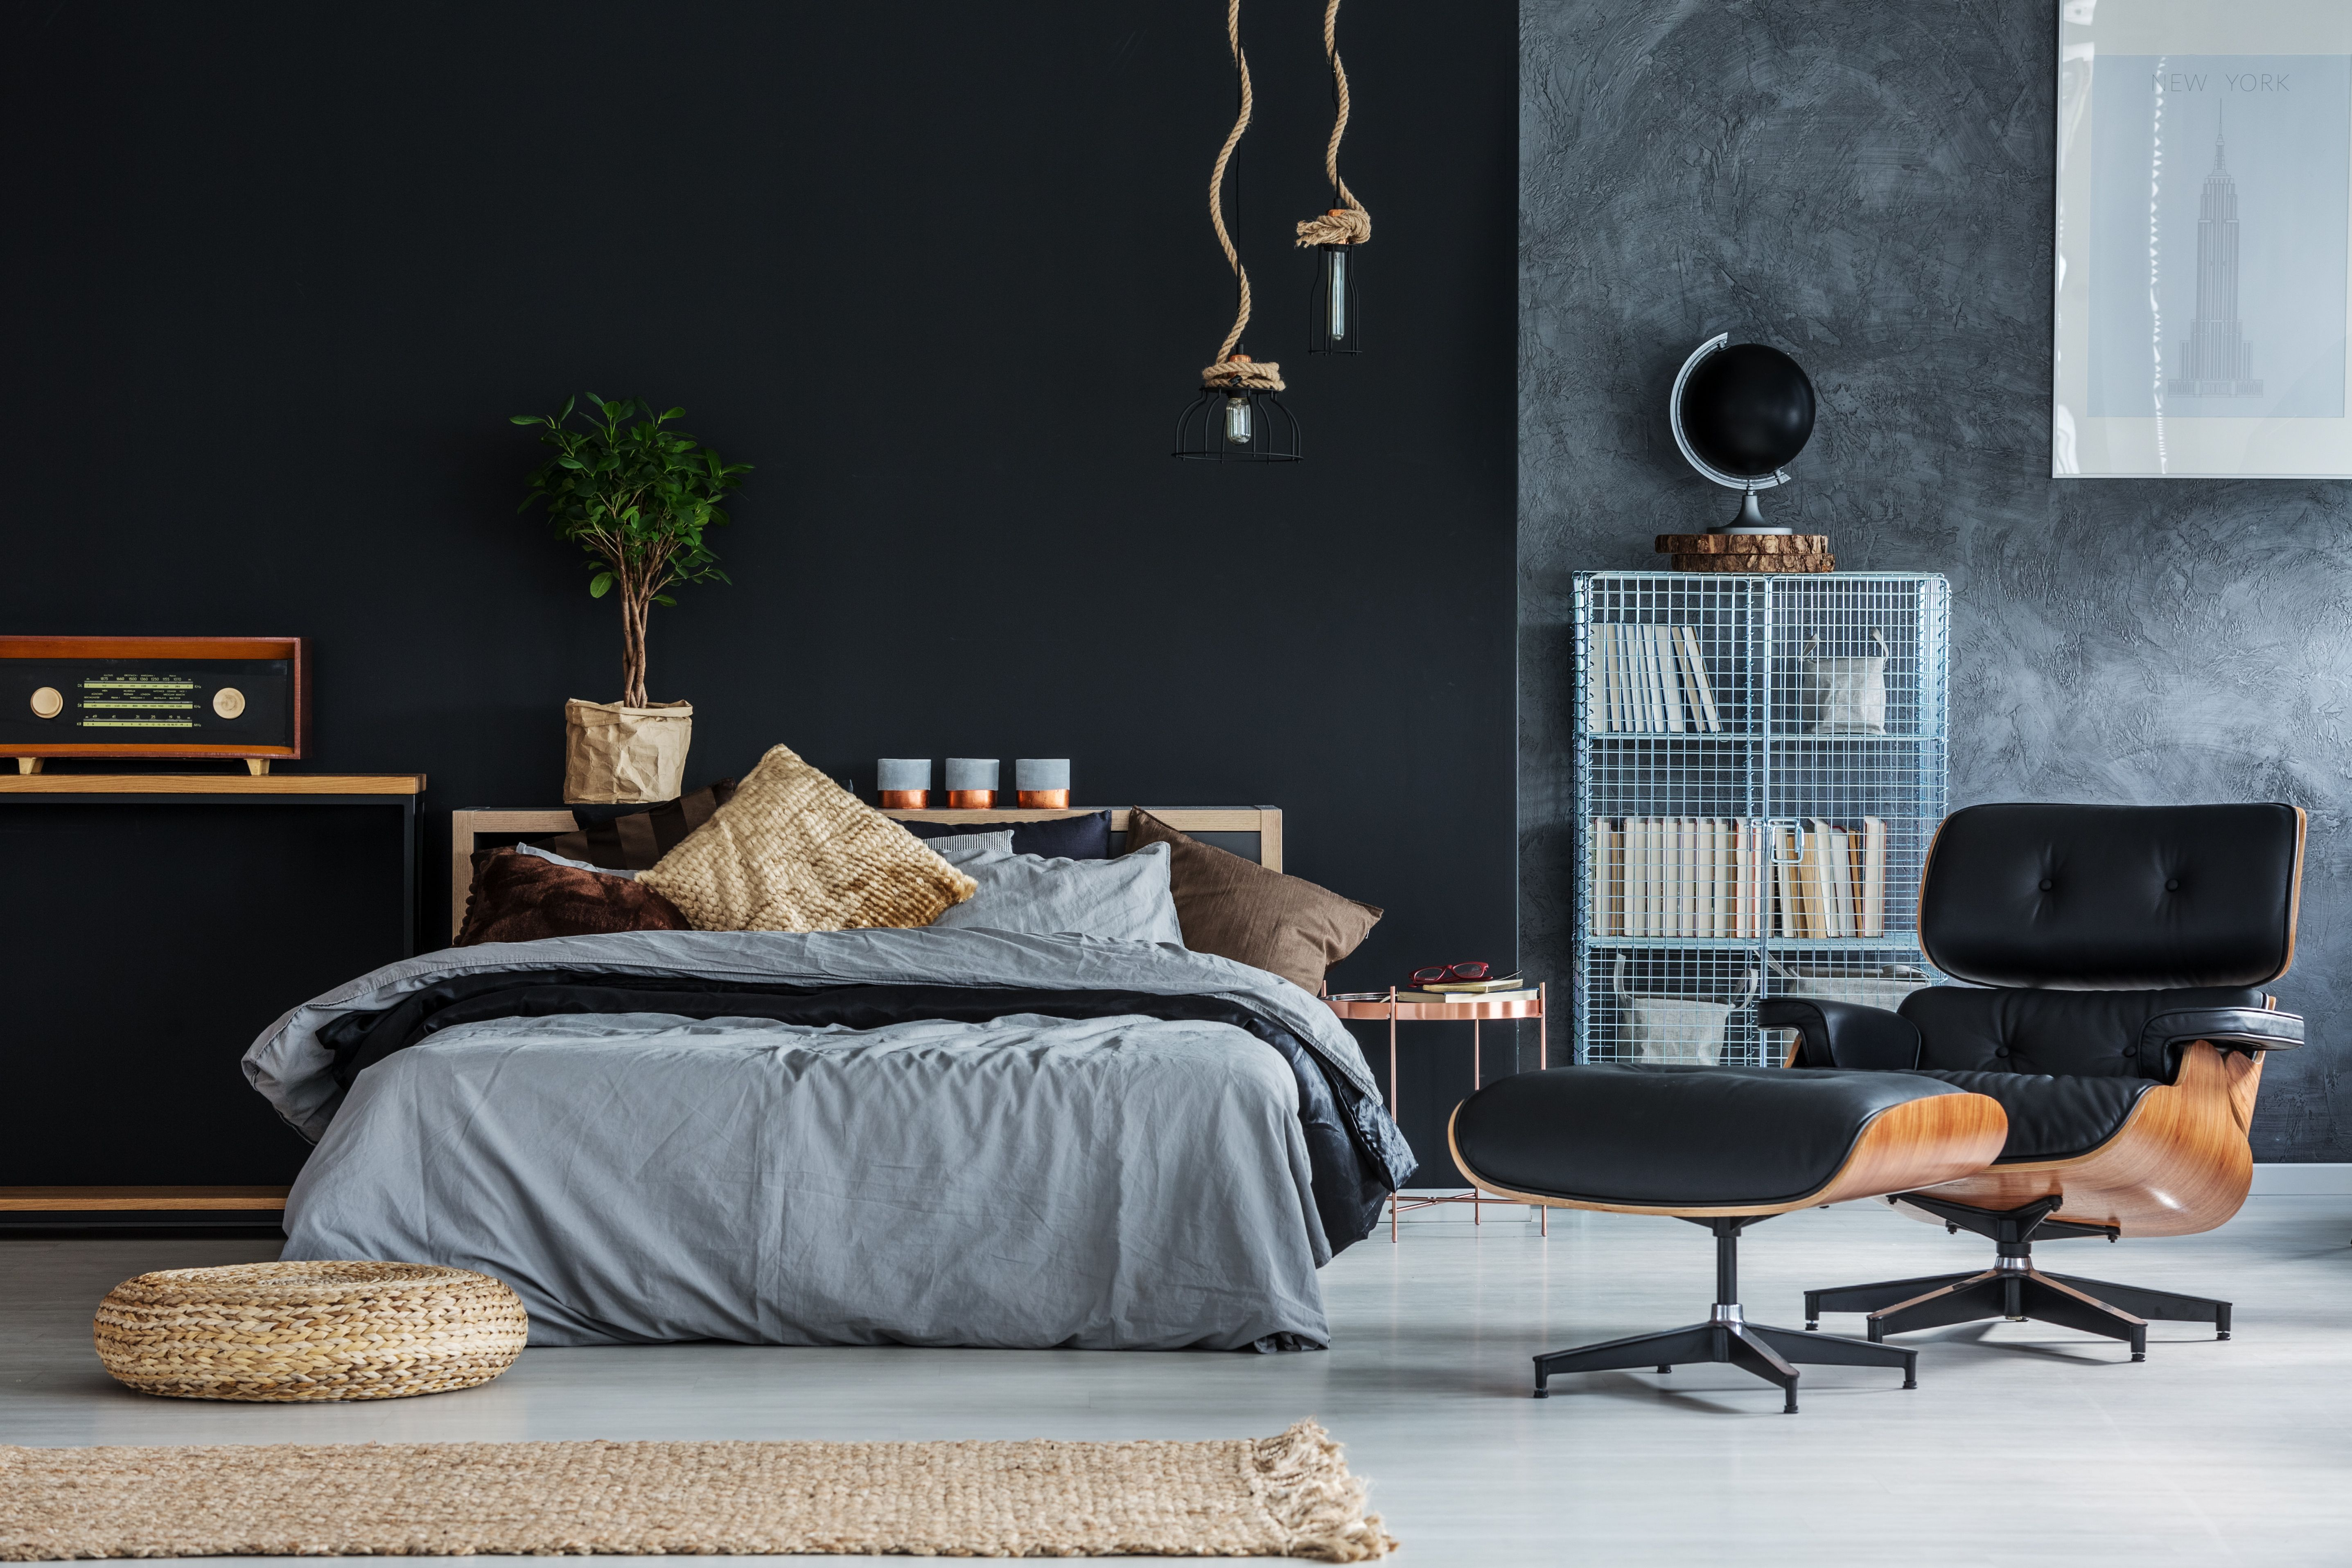 Cotton Organic Sheets Grey Bedroom Interior Home Furniture